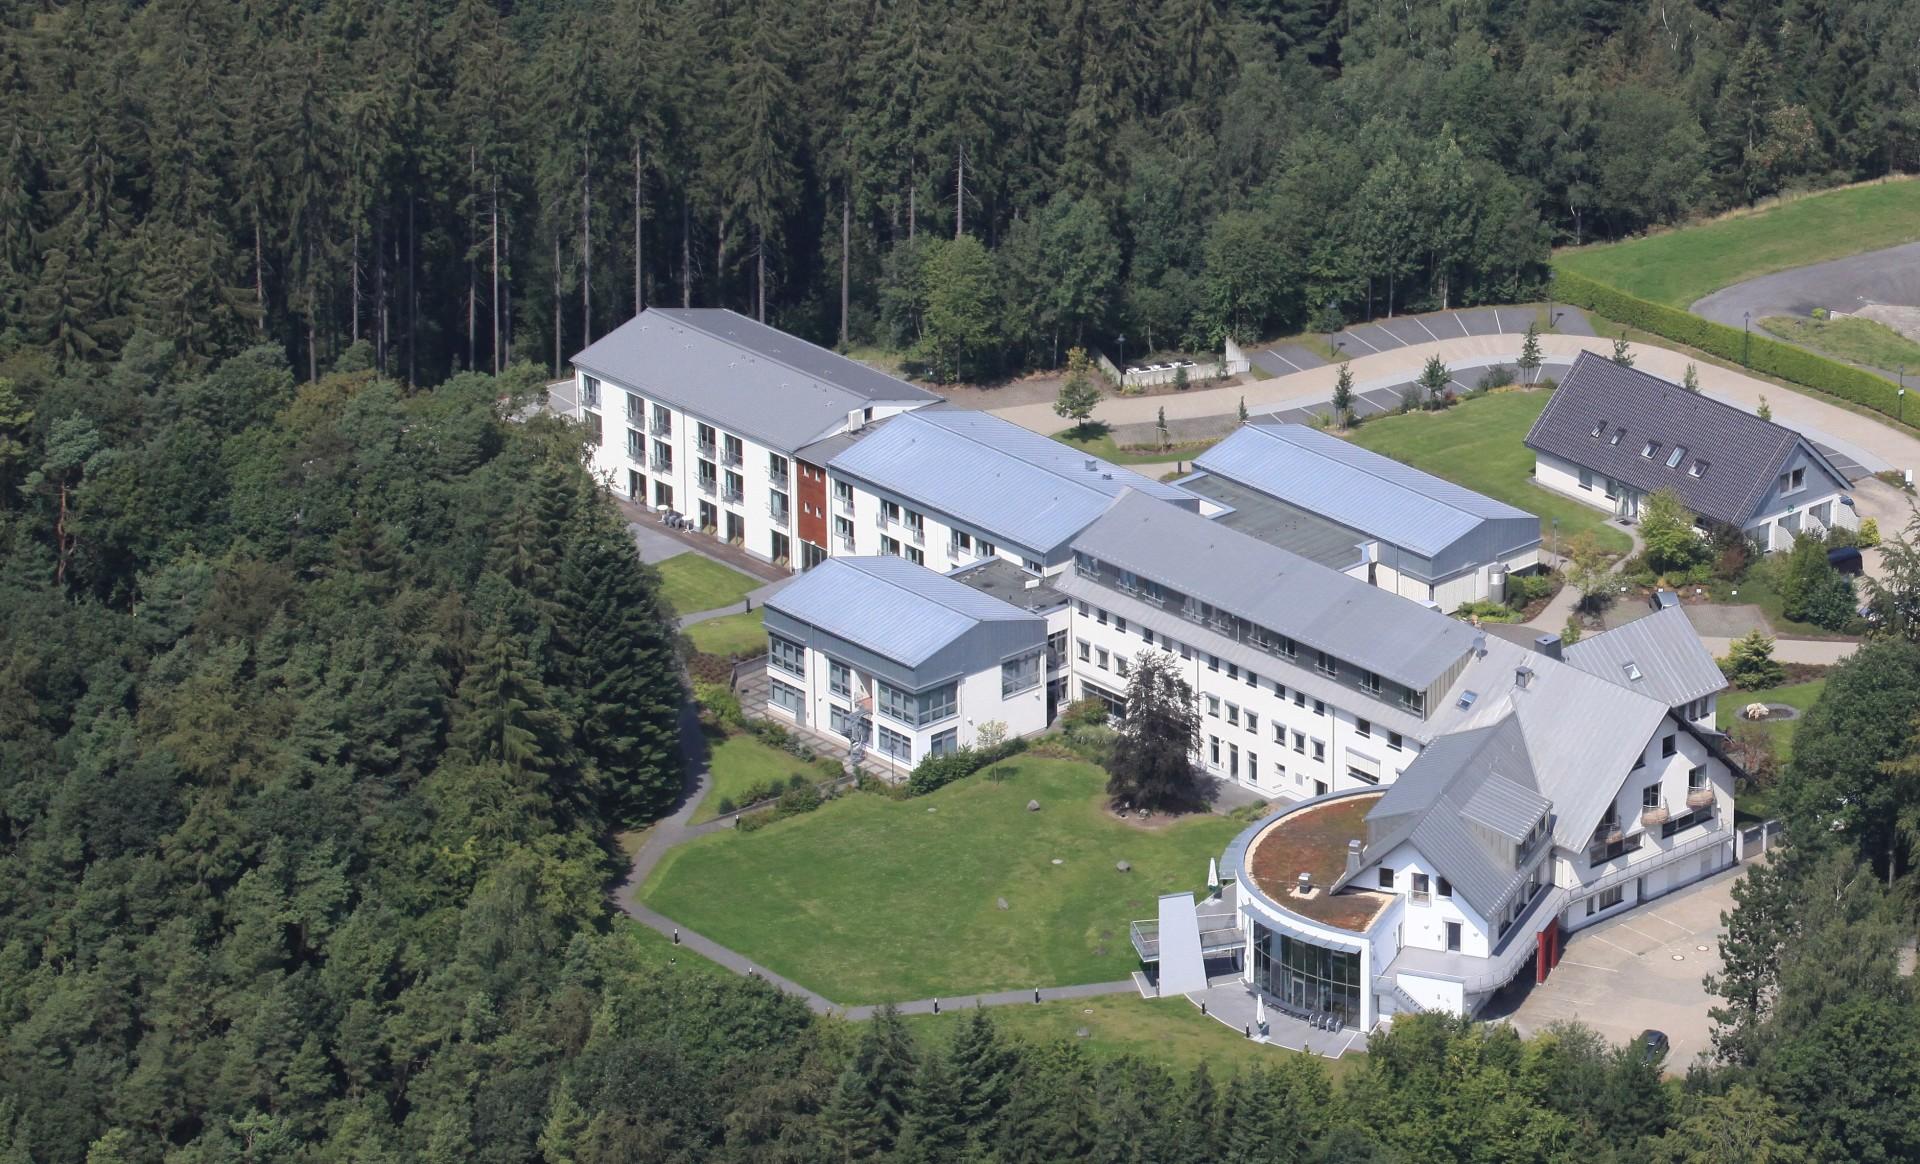 56729 RWE Bildungszentrum Wanderath Foto